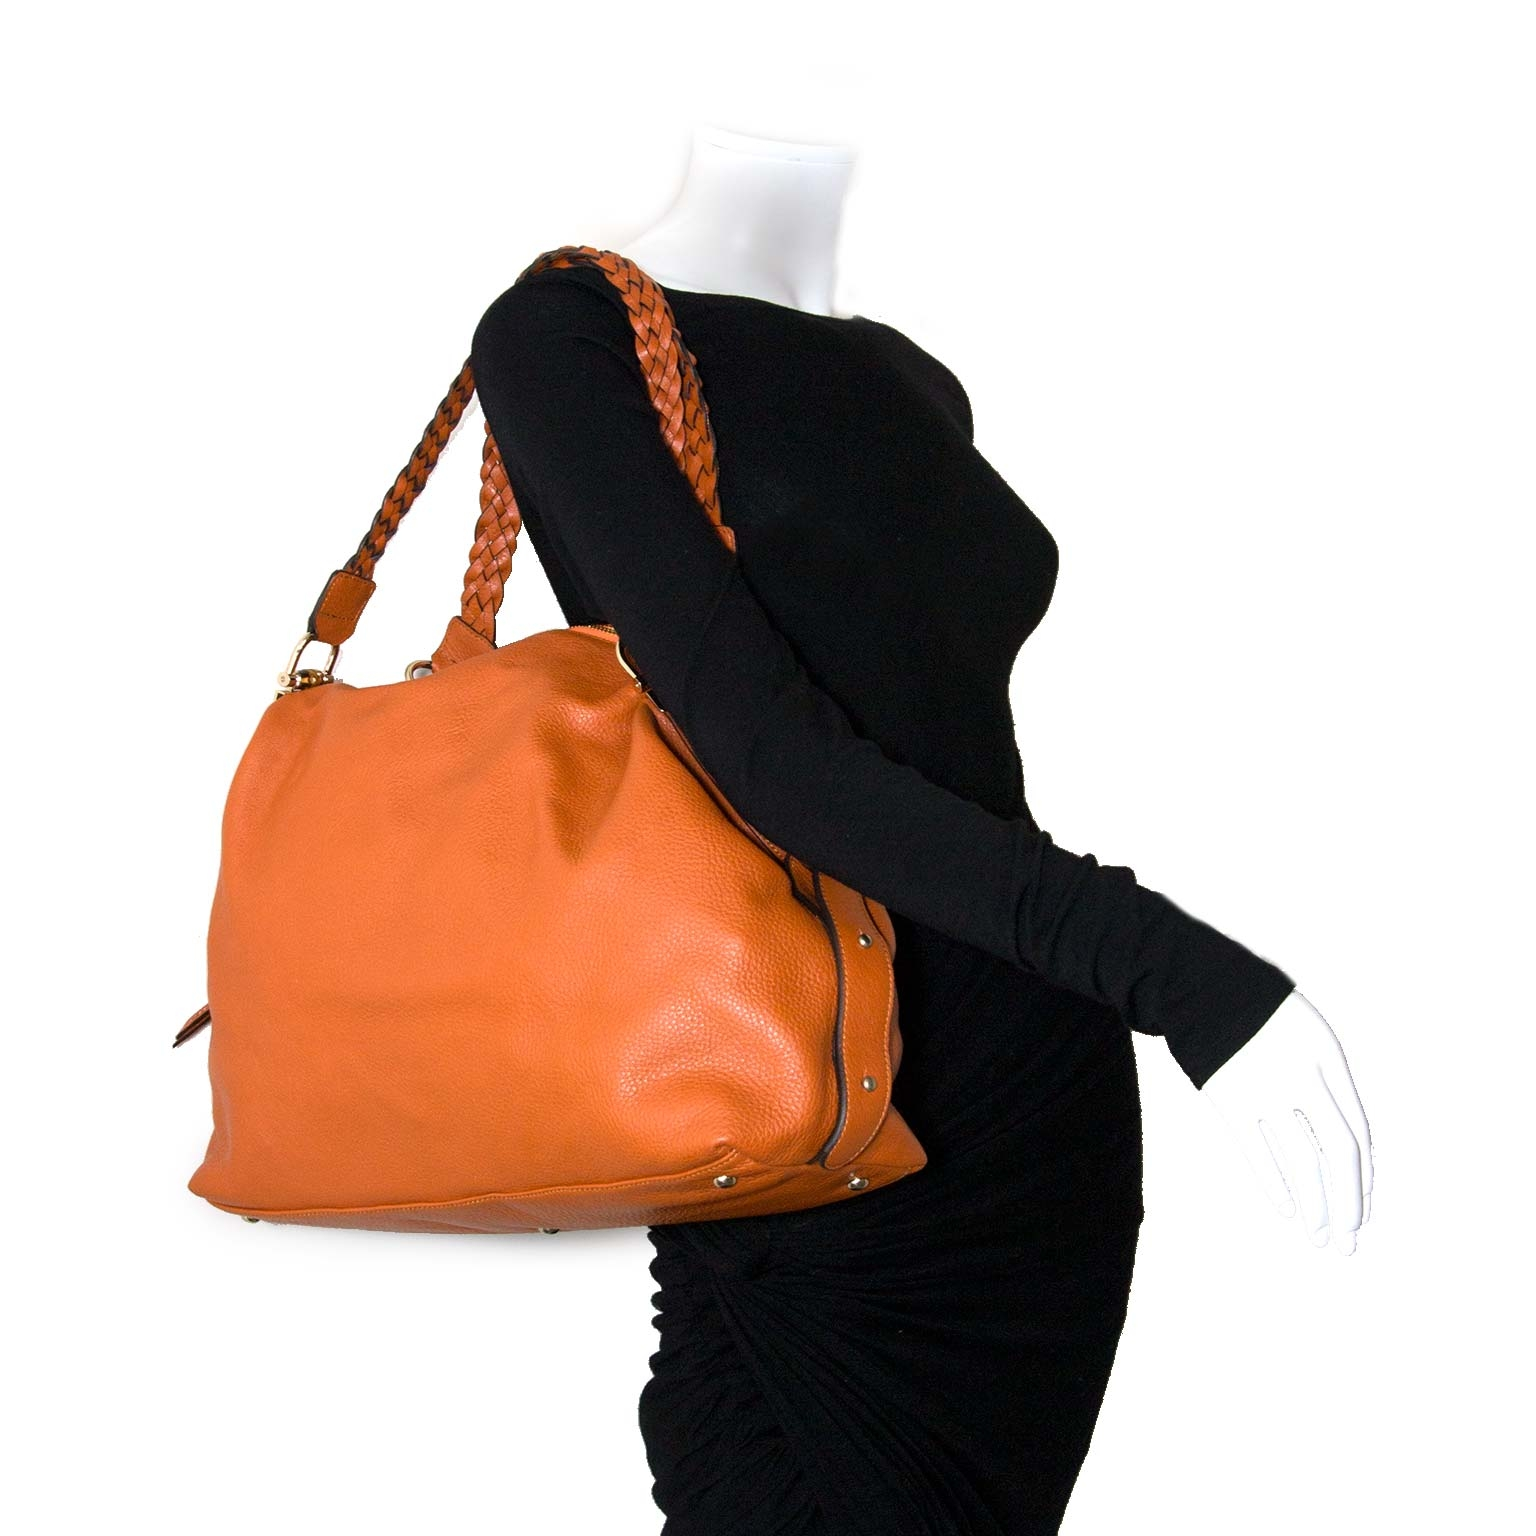 ... gucci orange  bamboo bar  shoulder bag at labellov vintage fashion  webshop belgium 139bf24057ad